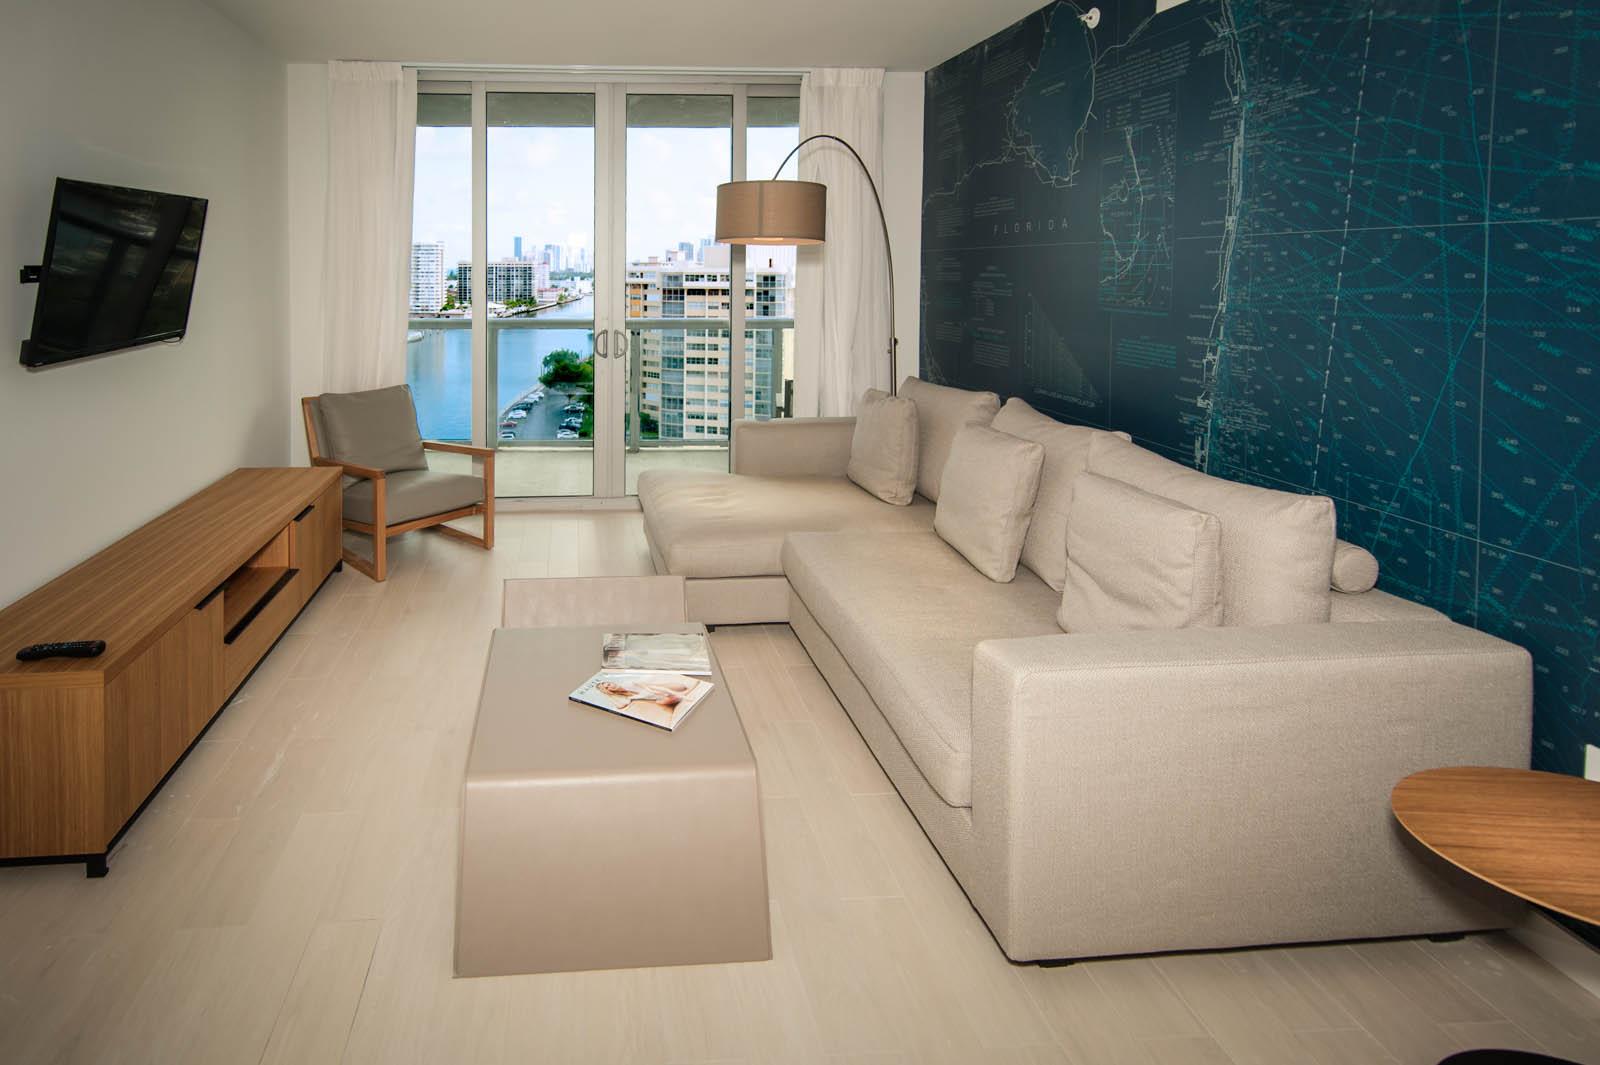 twobedroom apartment - One Bedroom Apartments In Miami